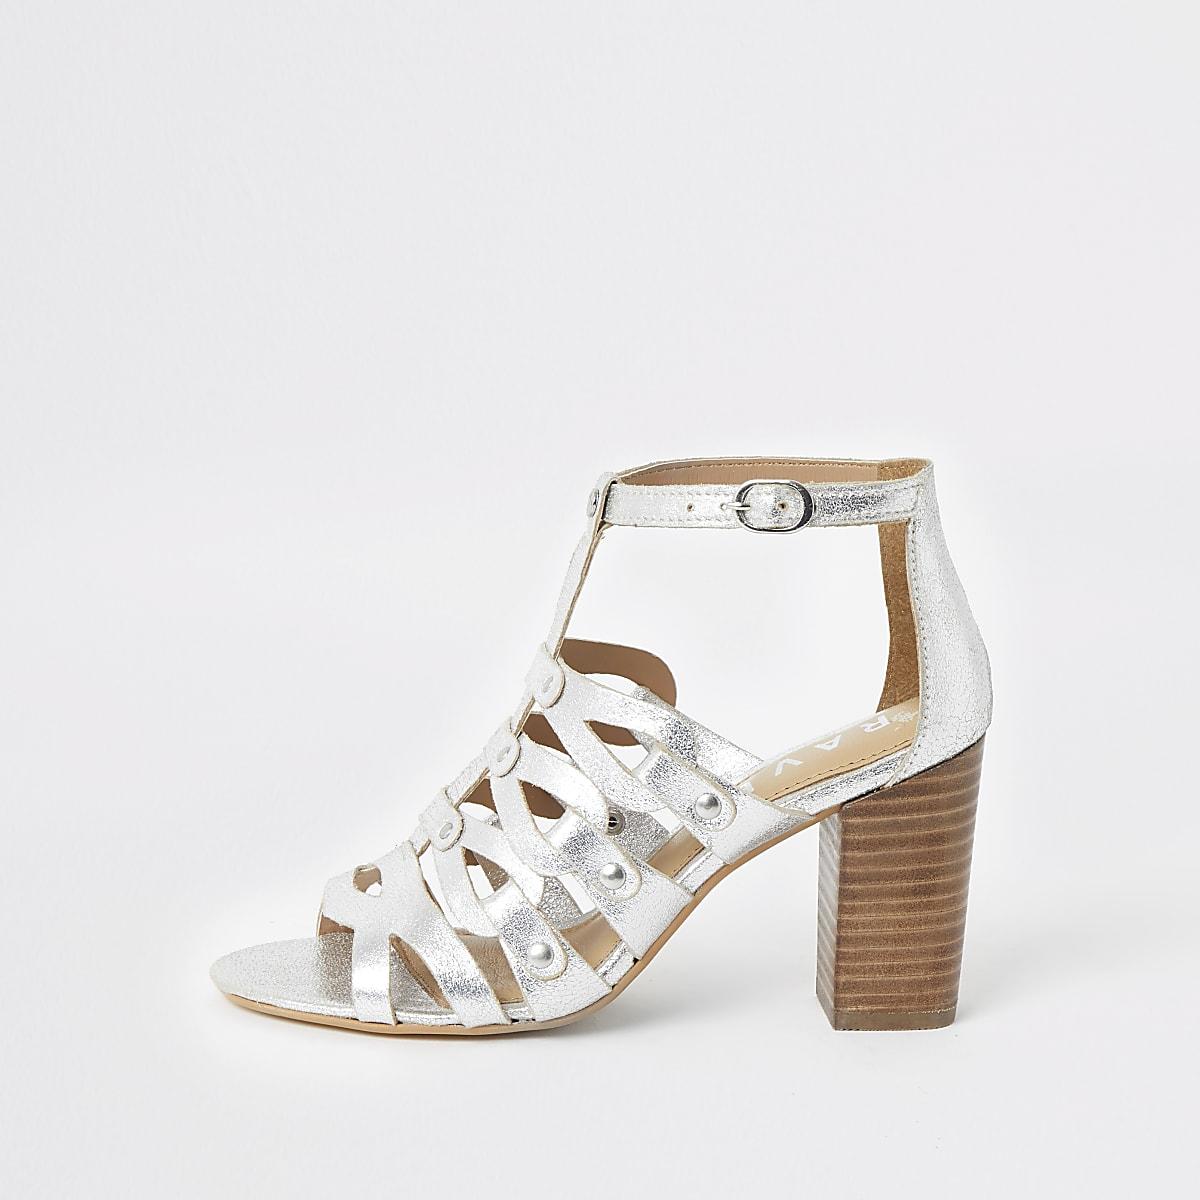 Ravel silver caged block heel sandals